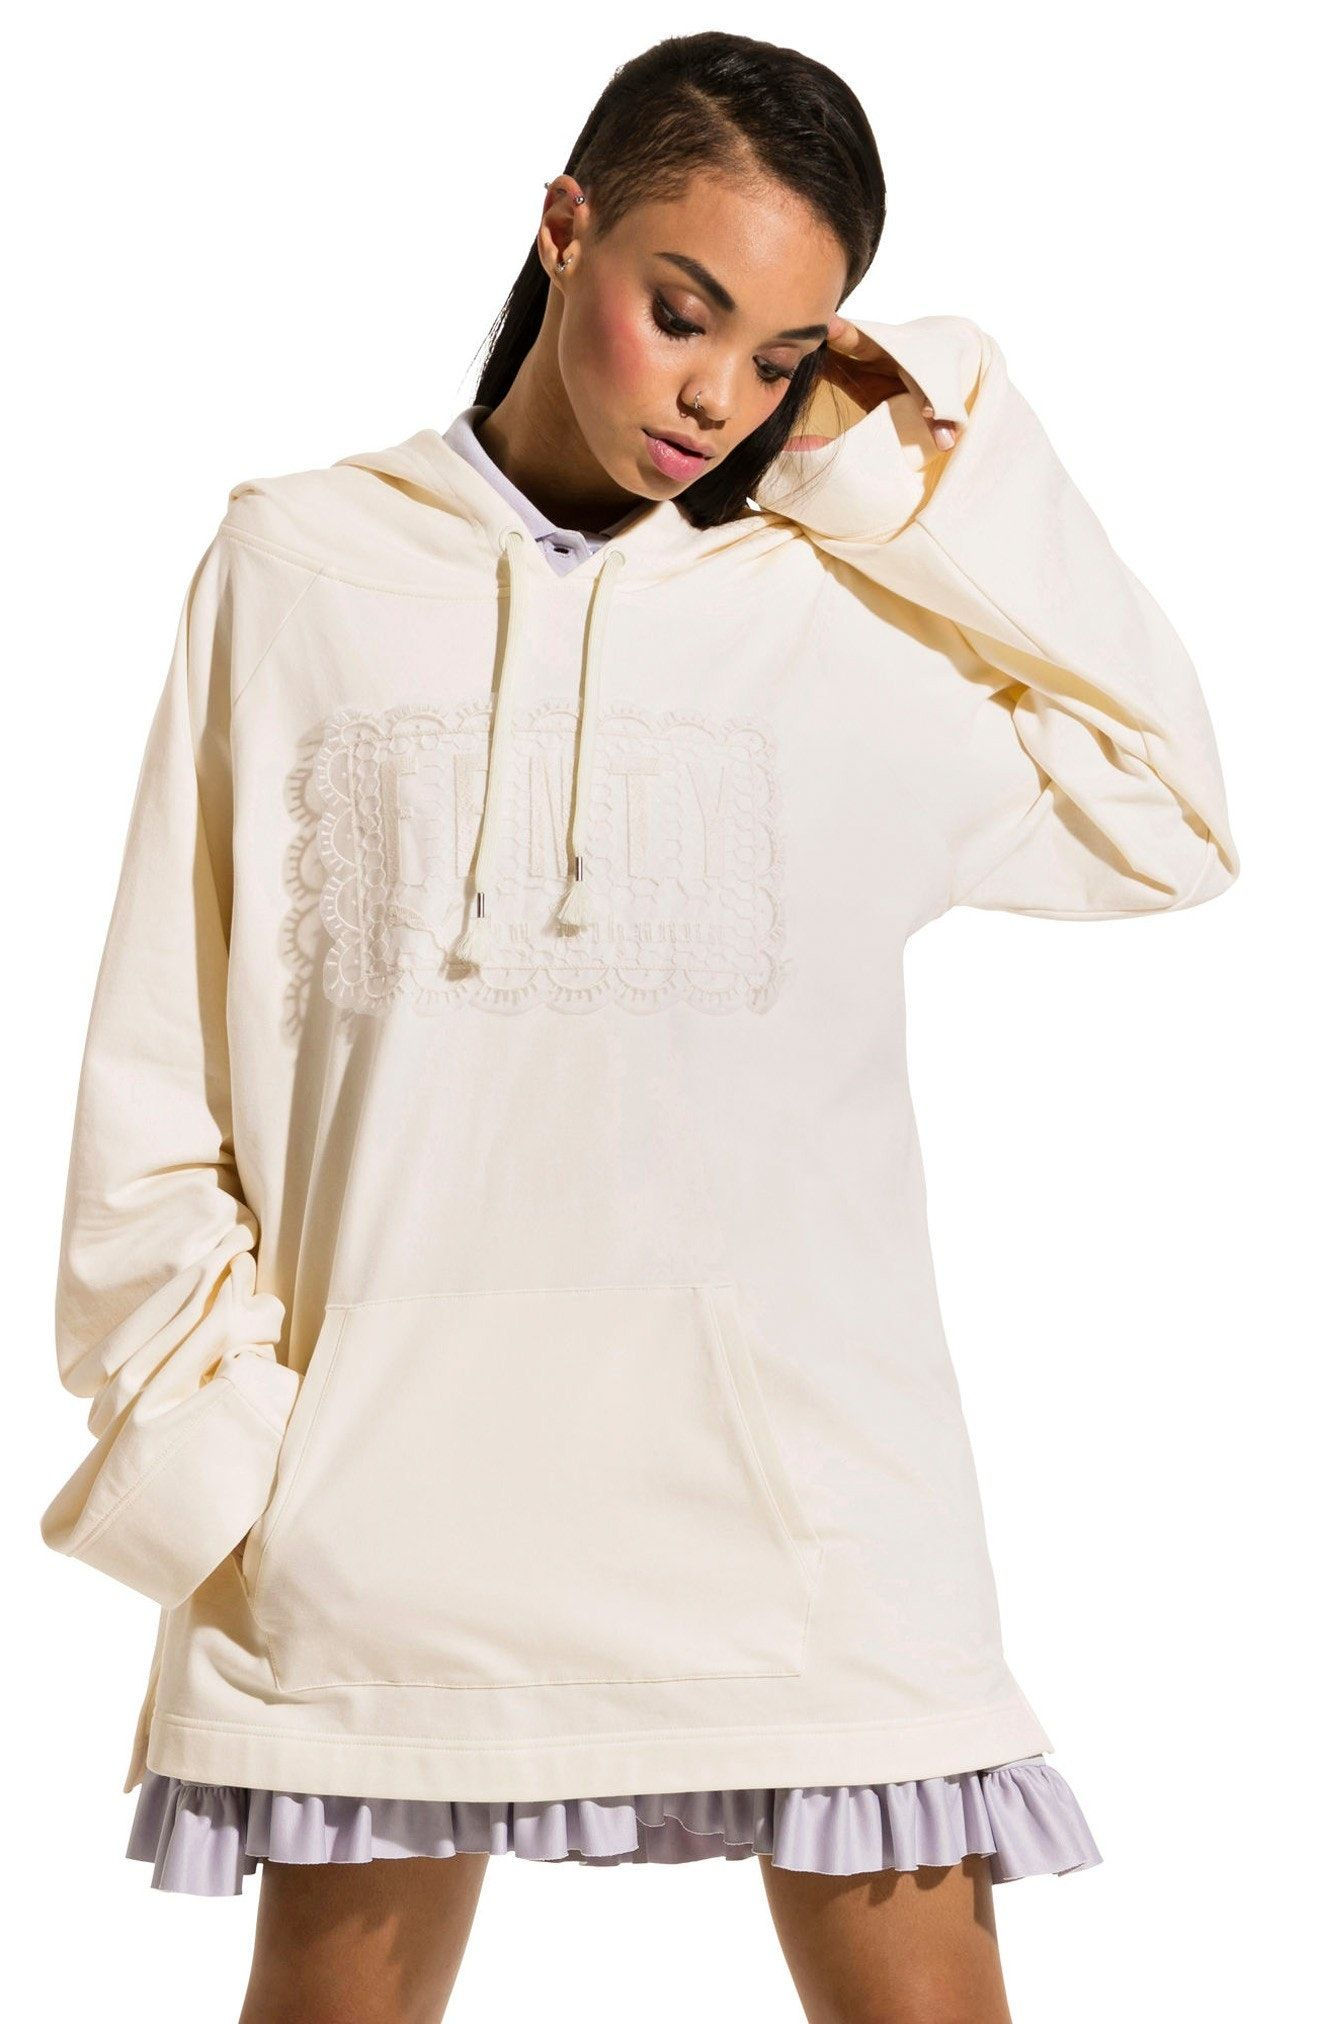 51ac2fb1c40 New FENTY PUMA by Rihanna Fleece Hoodie OLIVE BRANCH fashion online.   260   new offer from Newoffershop